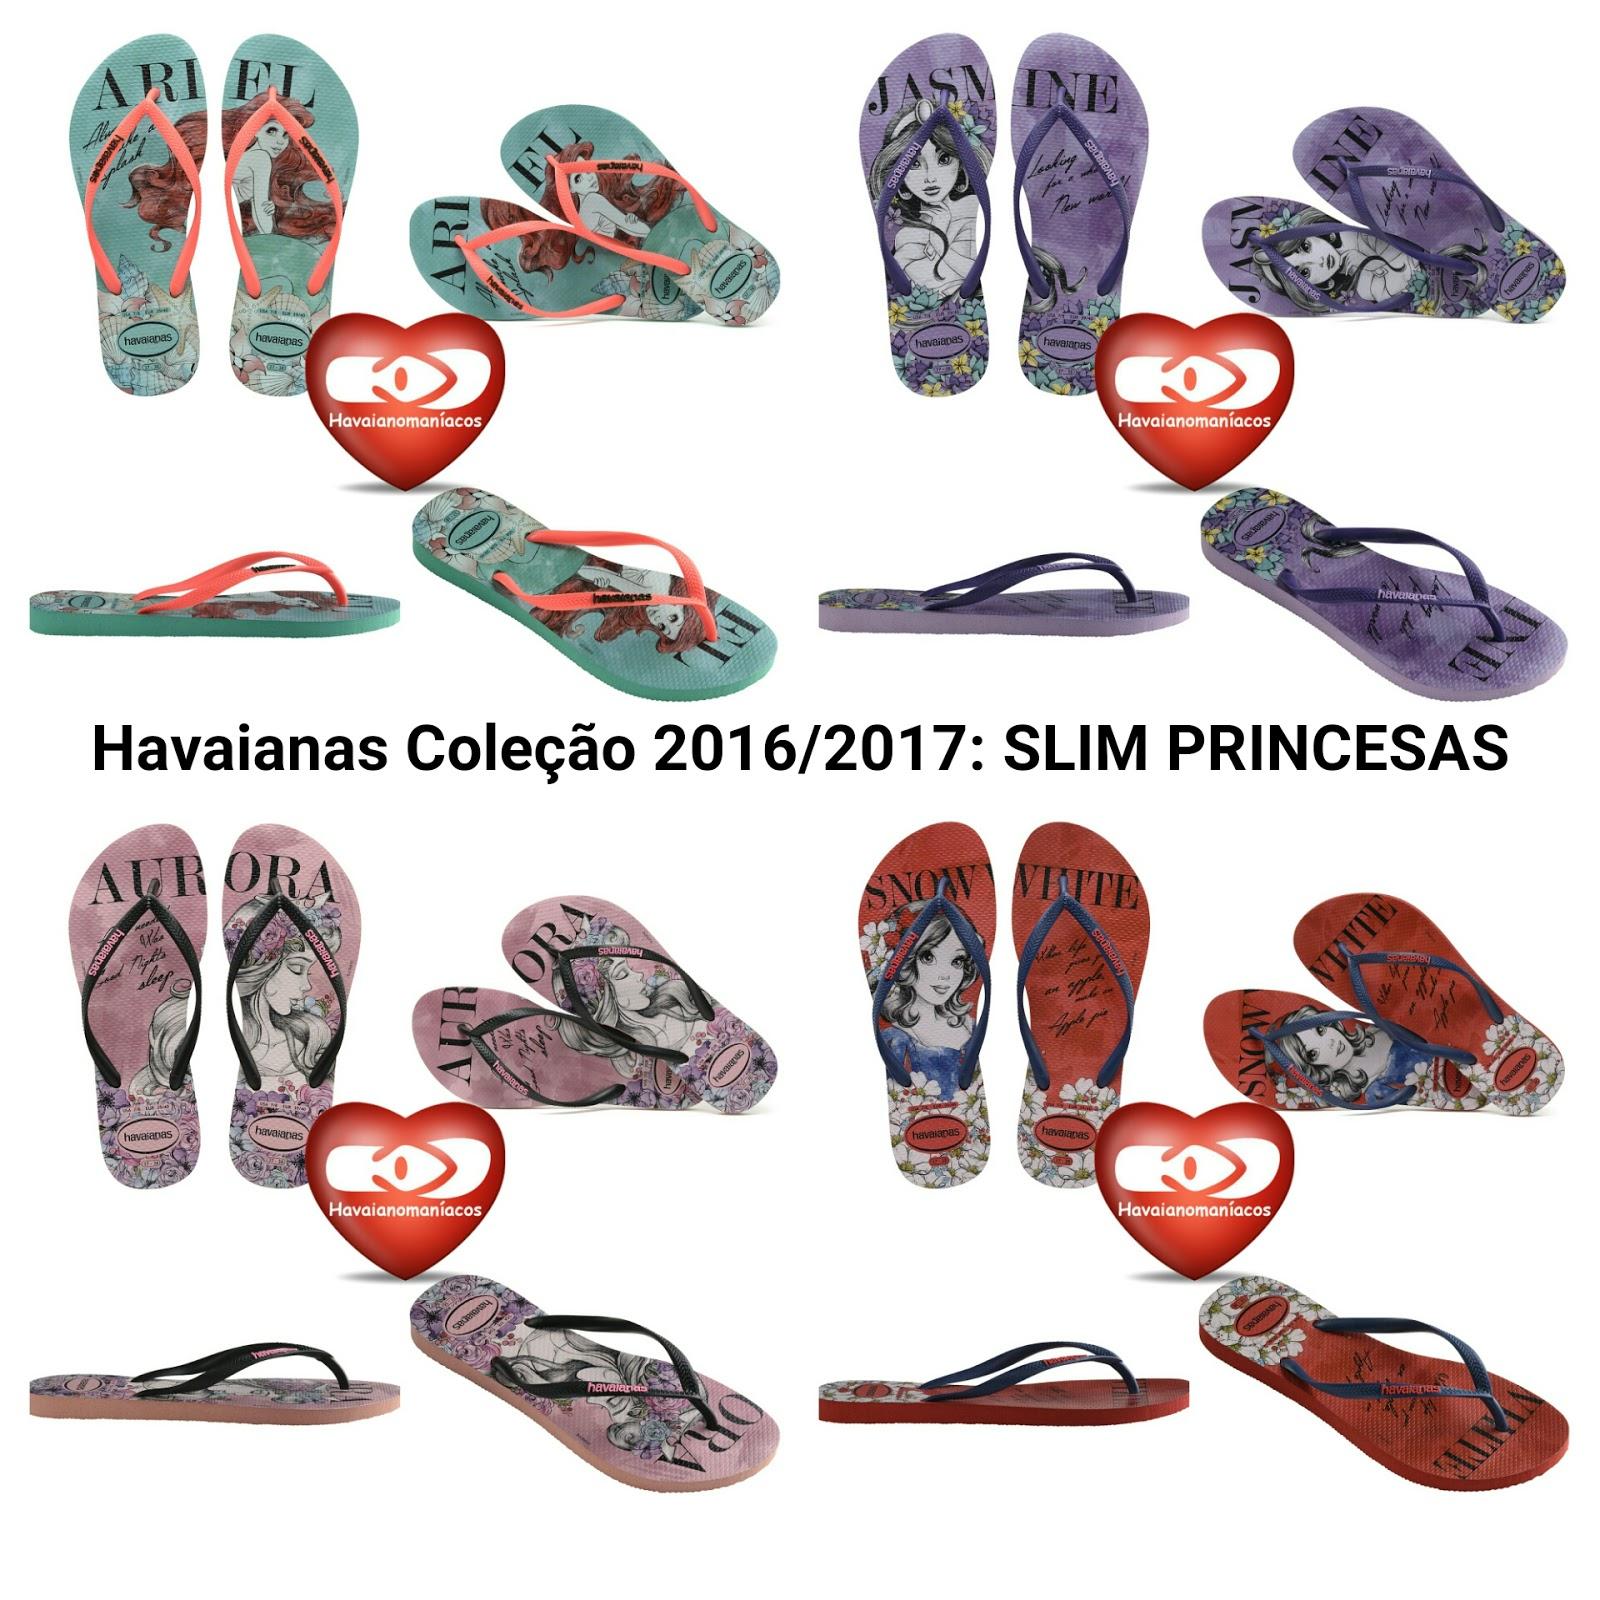 765d94557 Havaianas coleção 2016/2017: HAVAIANAS SLIM PRINCESAS